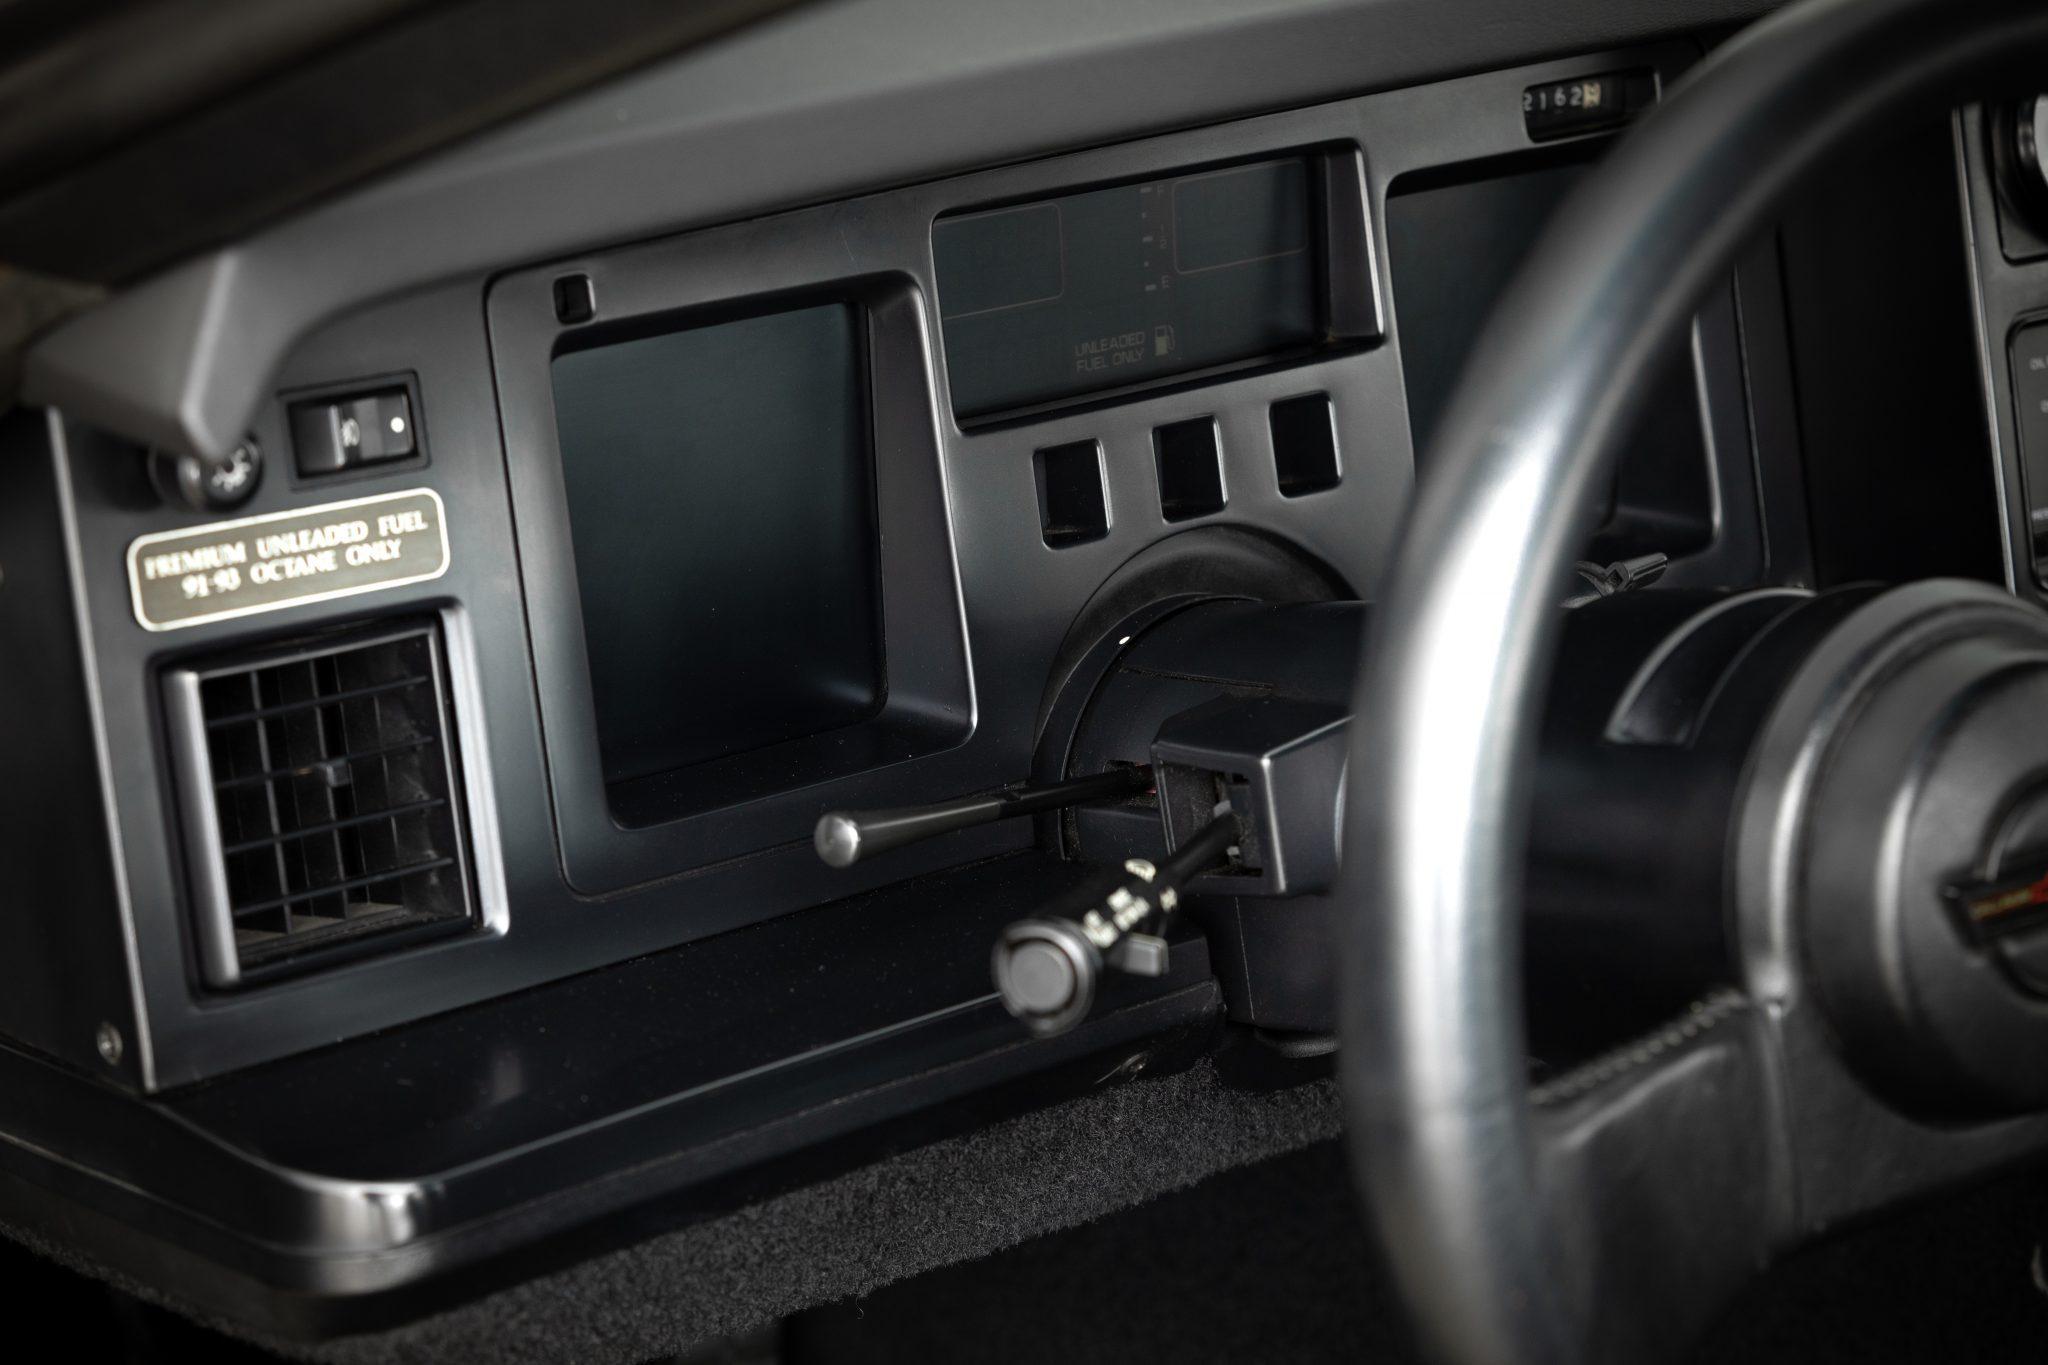 1988 Chevrolet Corvette Callaway SledgeHammer BaT interior dash